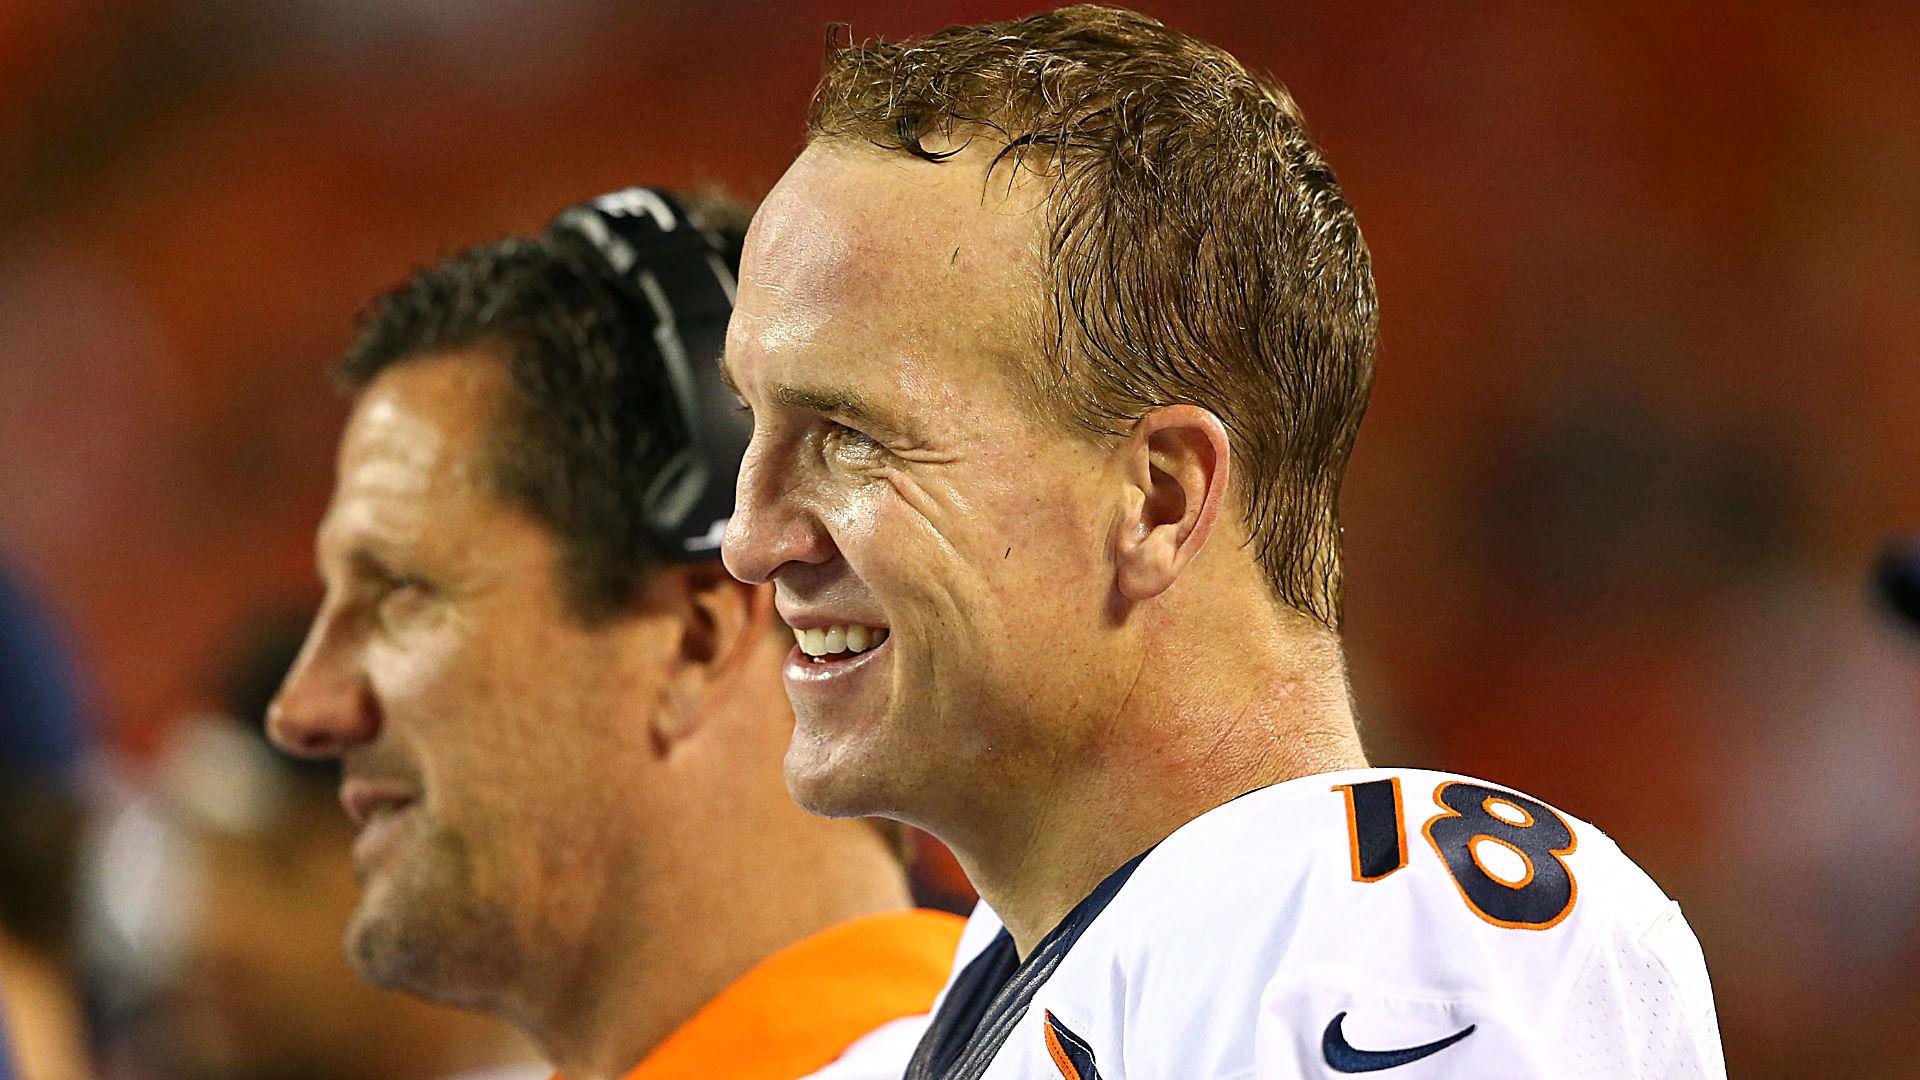 Peyton-Manning-091815-Getty-FTR.jpg